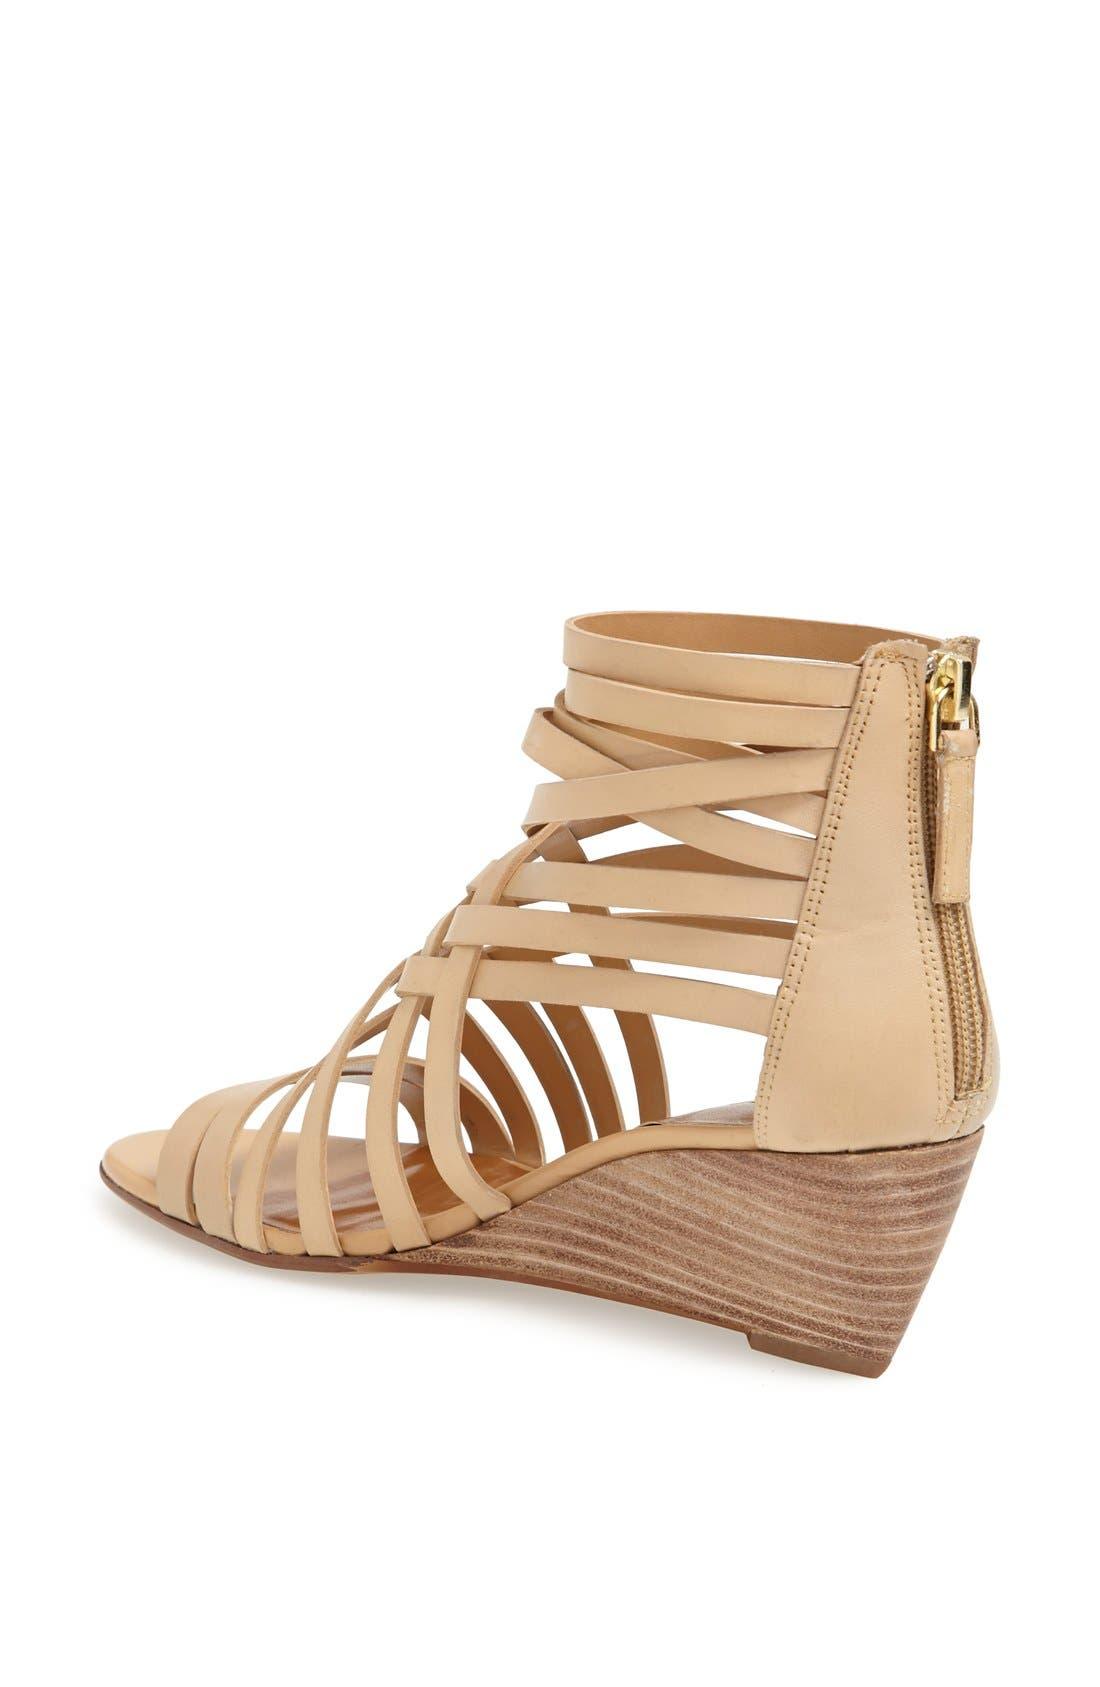 ,                             'Neta' Leather Wedge Sandal,                             Alternate thumbnail 18, color,                             252